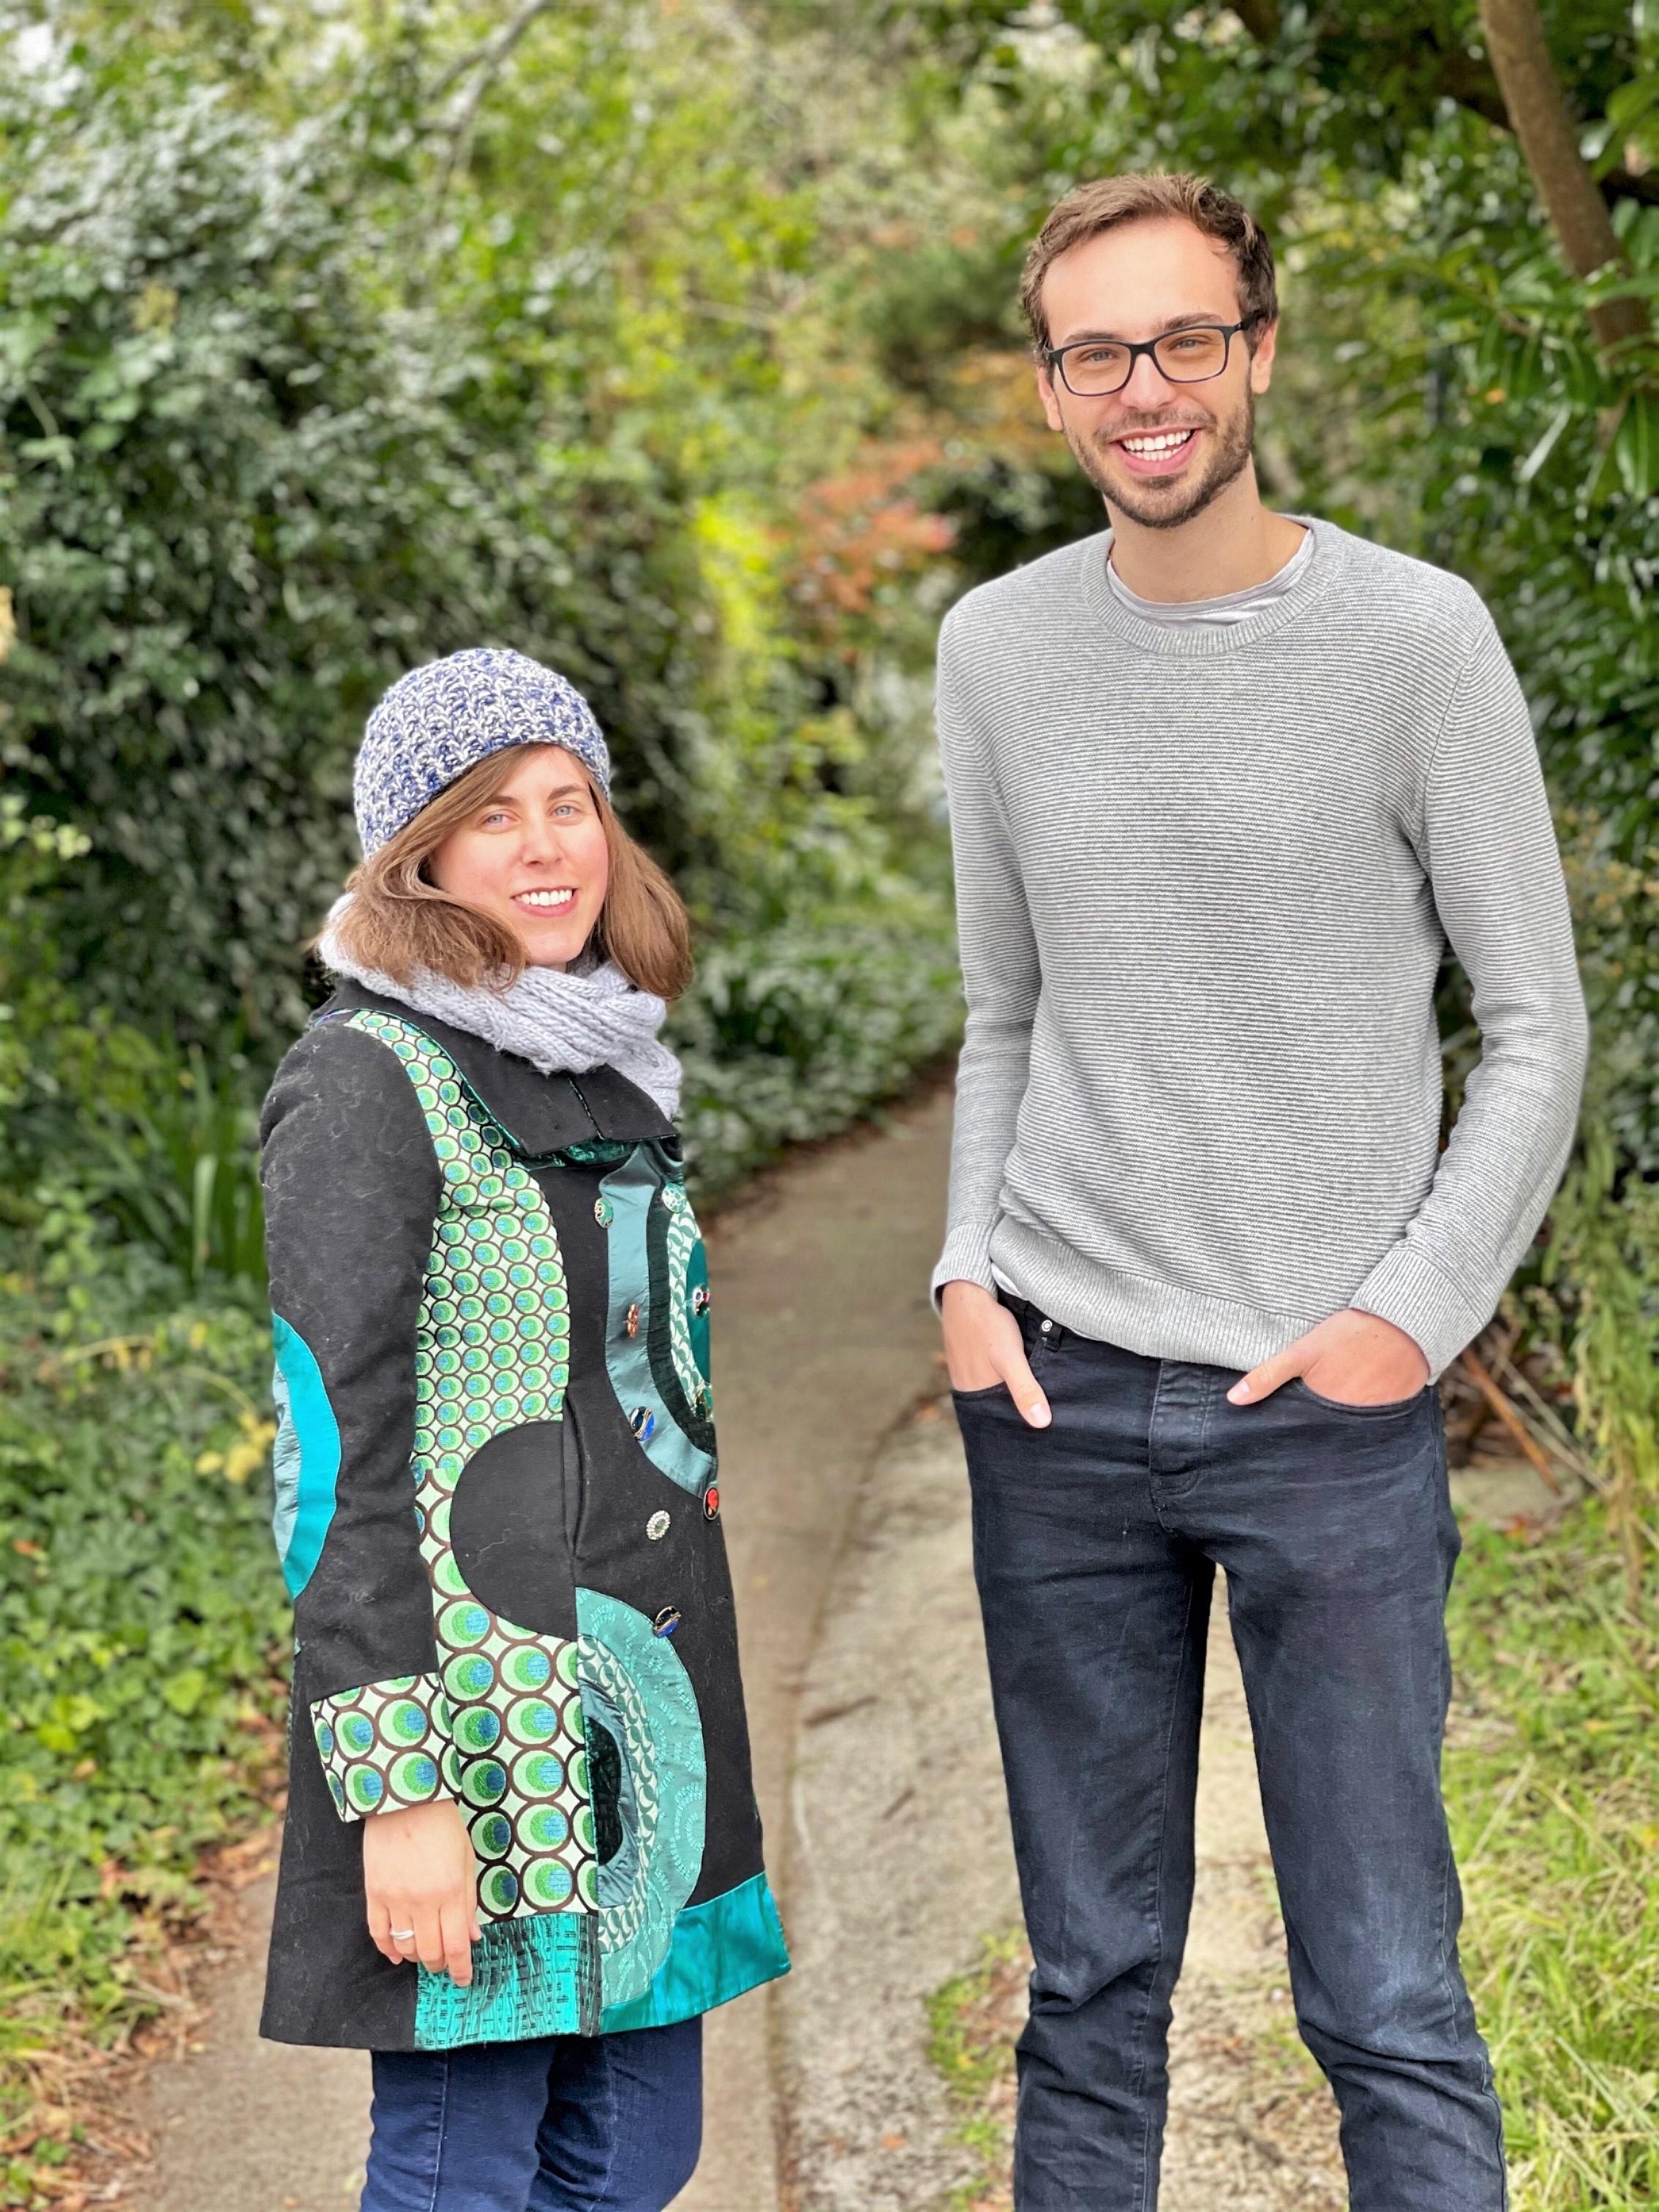 Ashley Kalagian Blunt and James McKenzie Watson